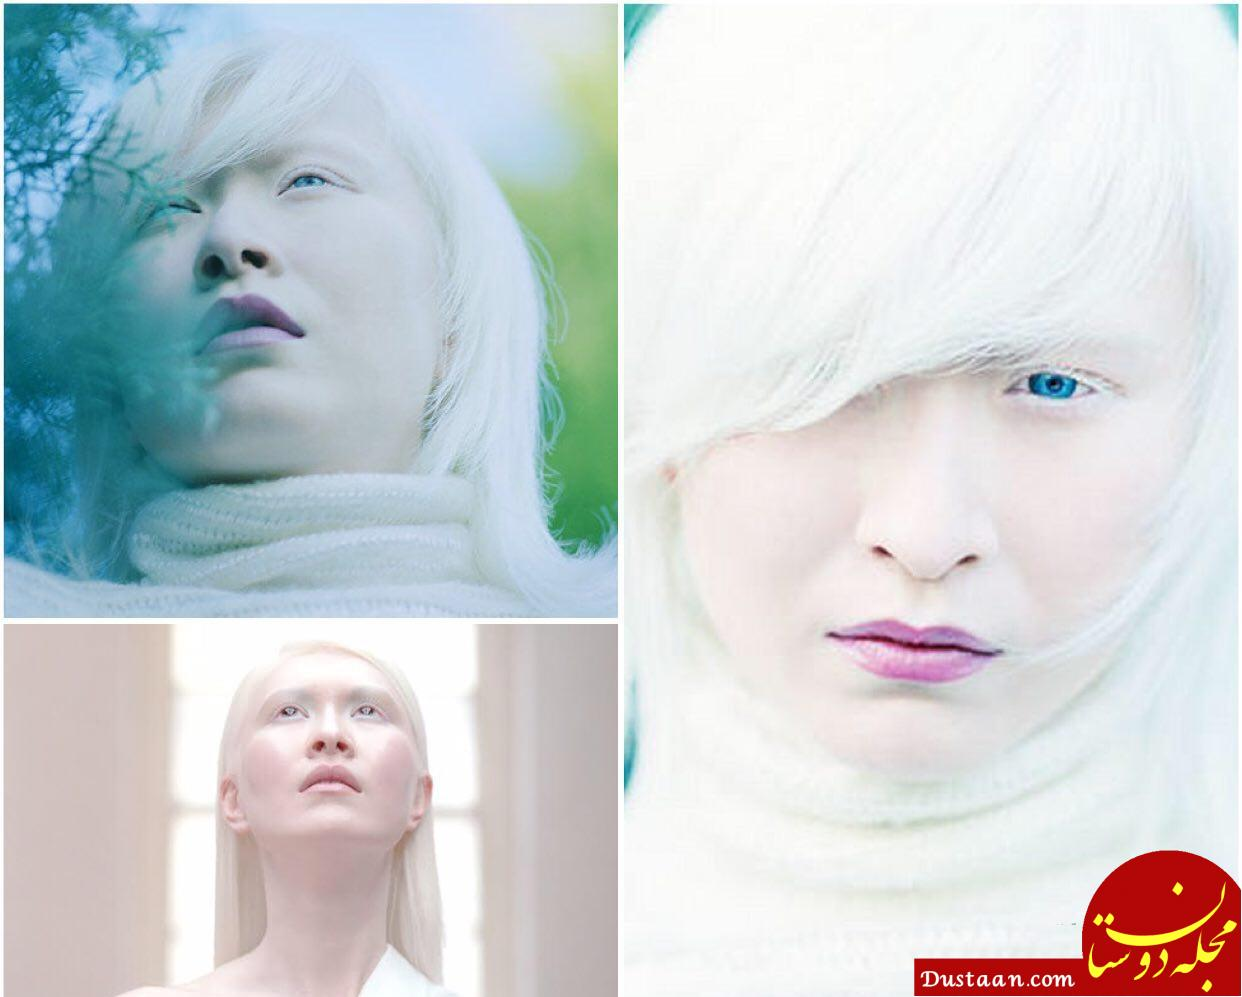 www.dustaan.com دختری زیبا با پوستی سفید و خیره کننده! +عکس